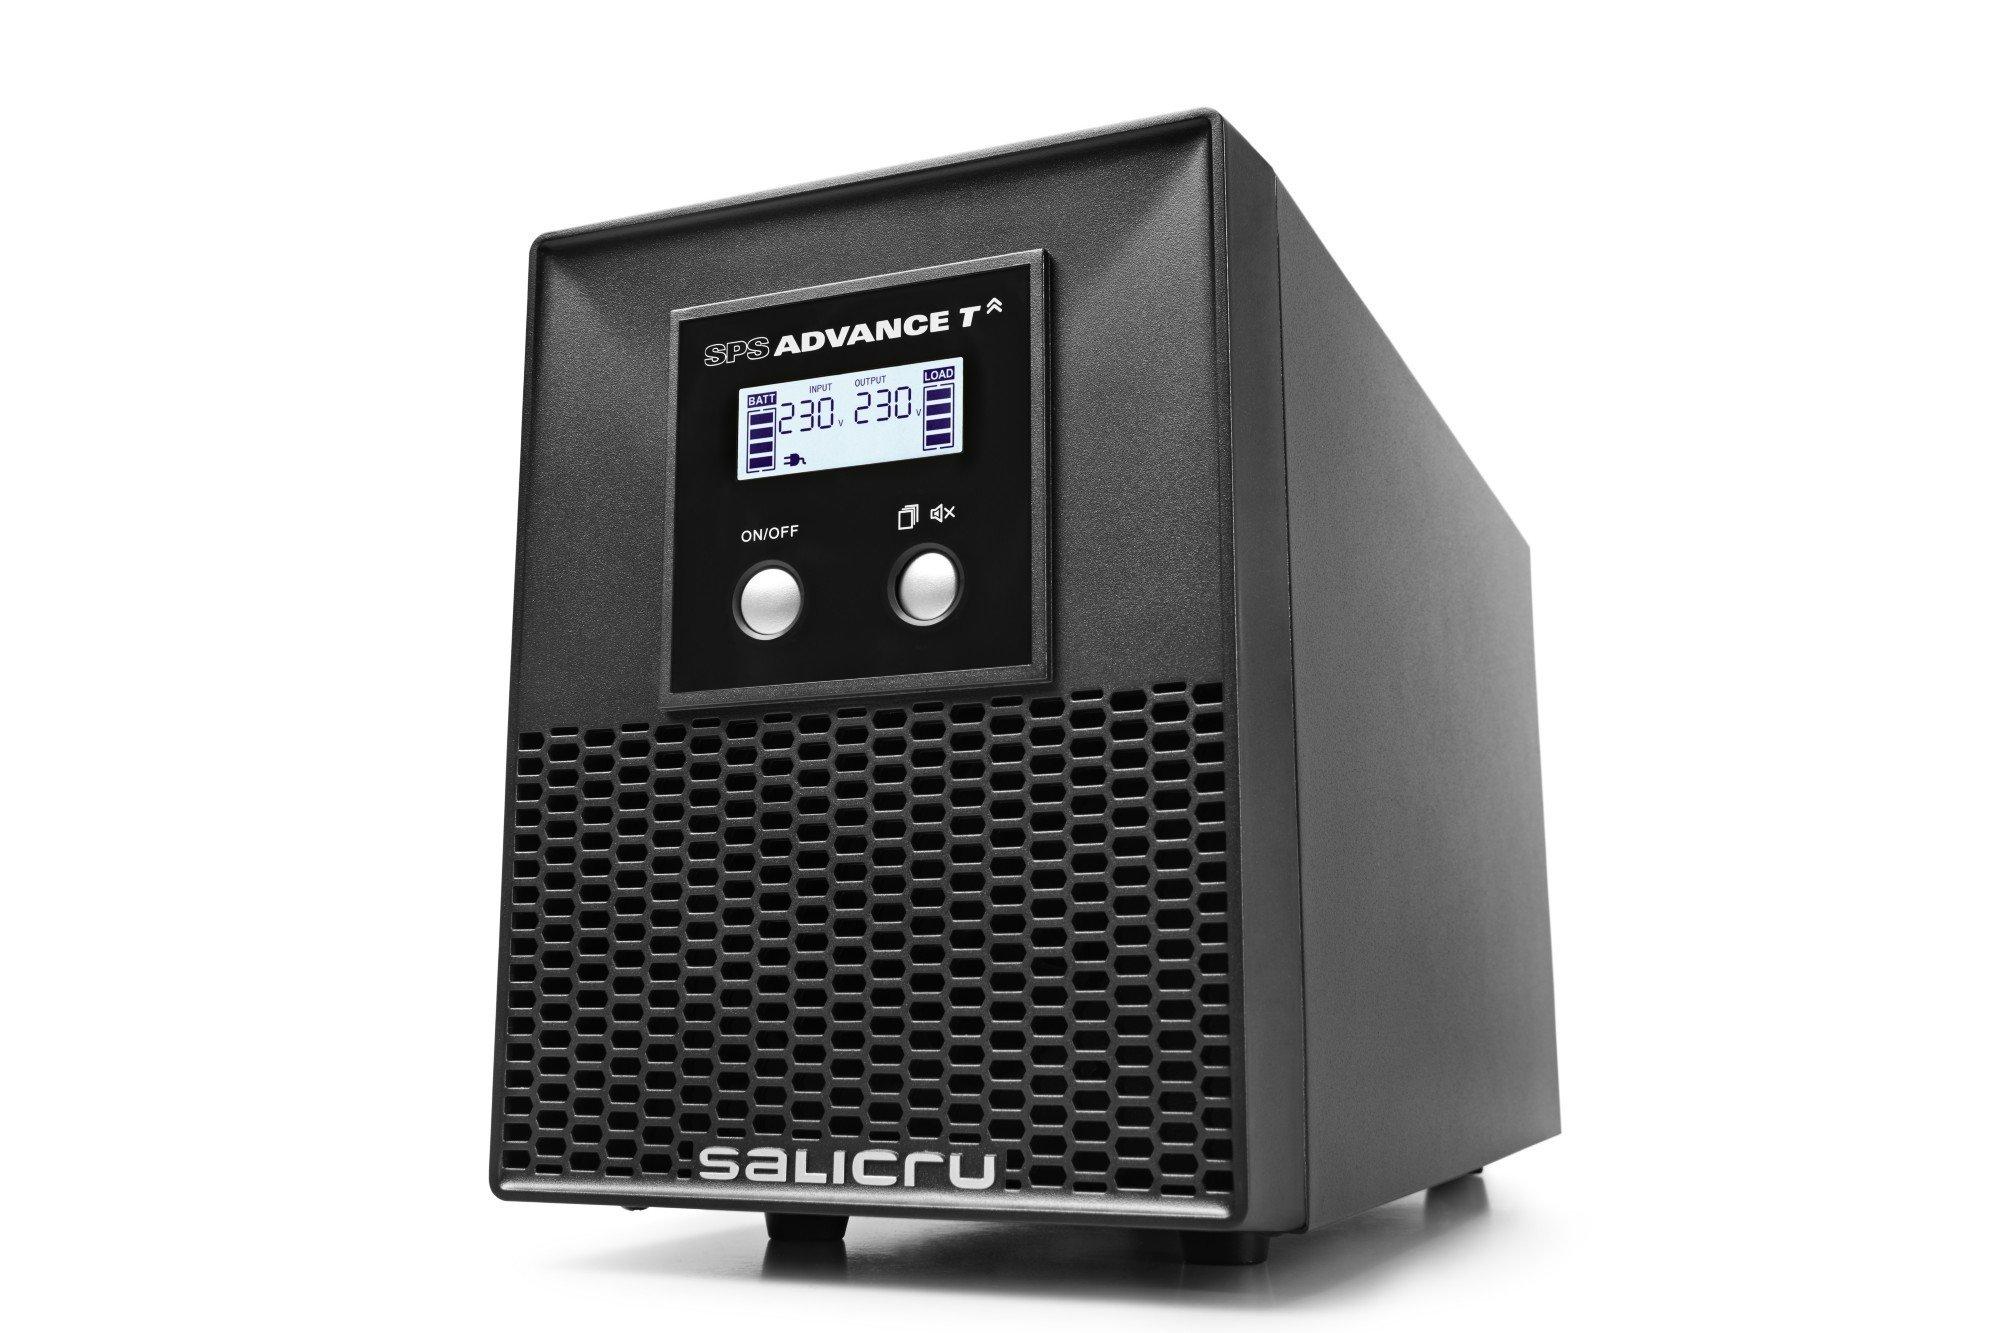 An image of Salicru SPS Advance T 1.5kVA Line Interactive 230V (UPS)